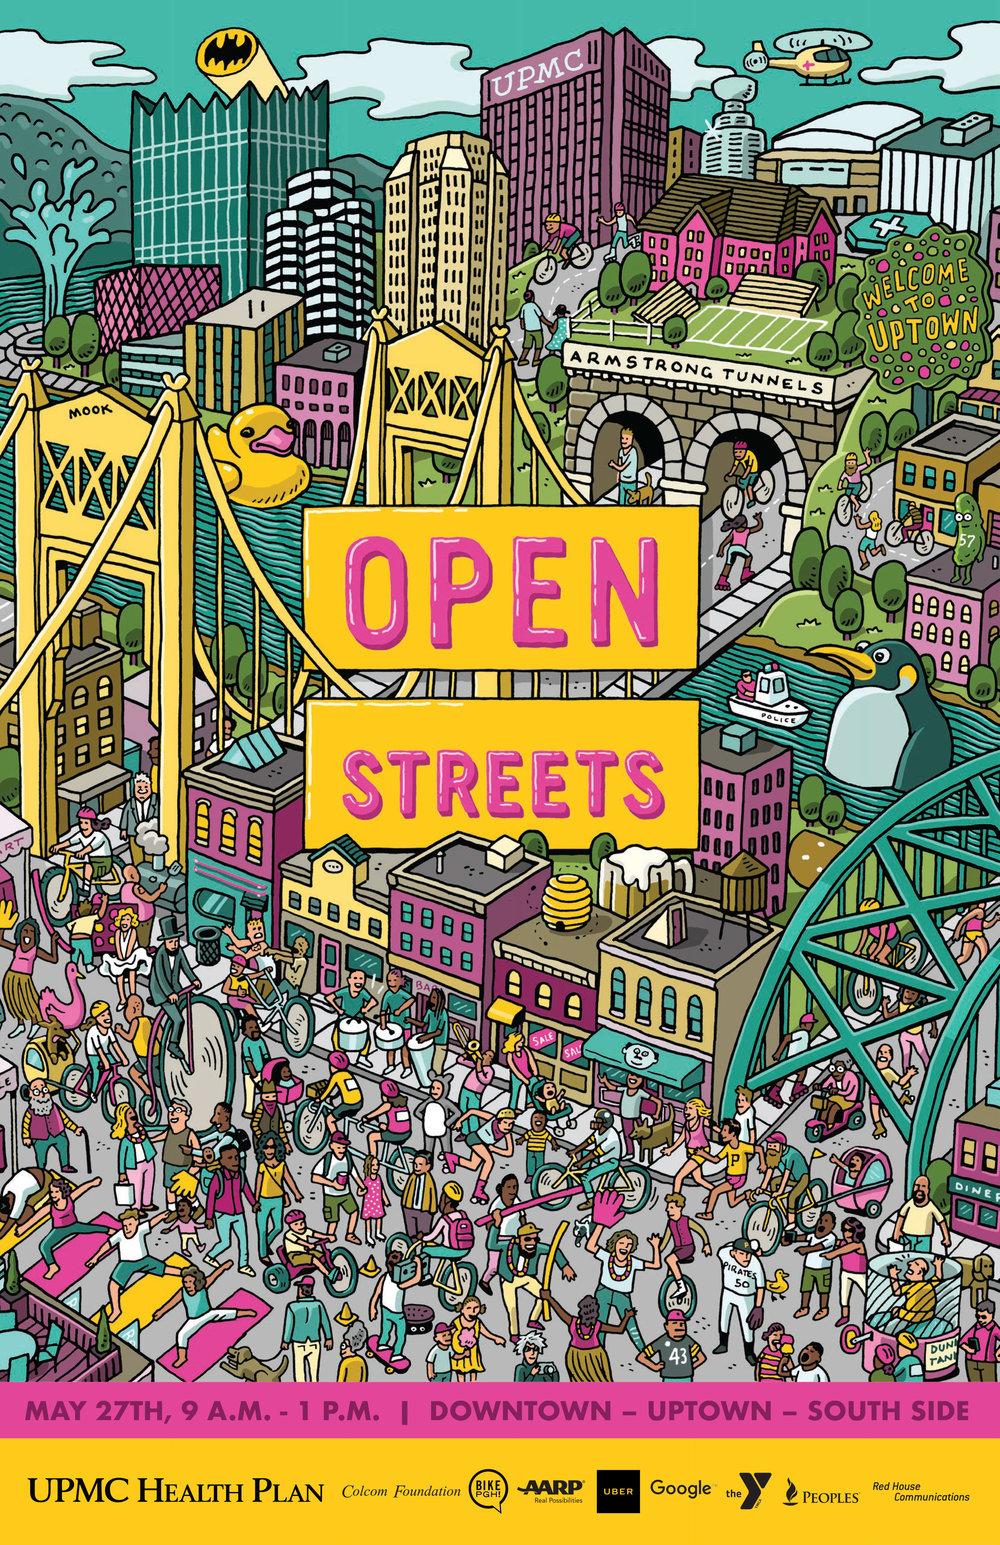 openstreetspgh-poster.jpg